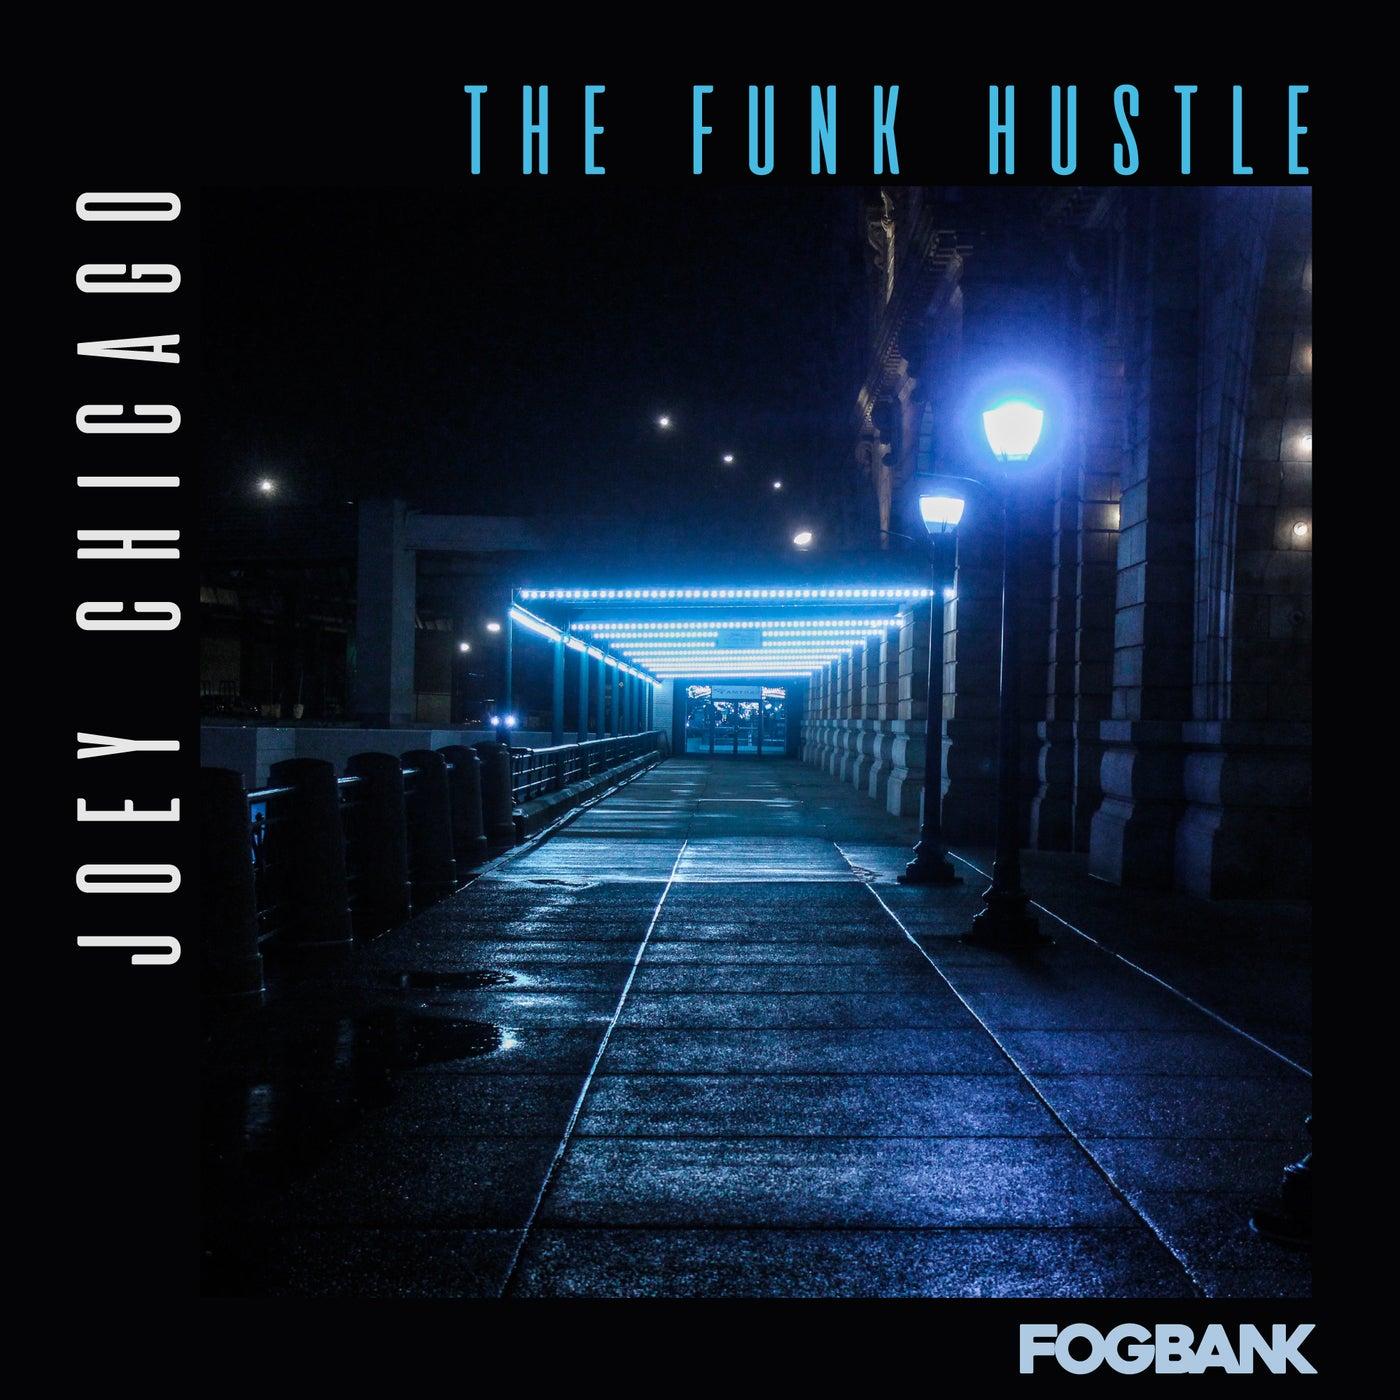 The Funk Hustle (Original Mix)